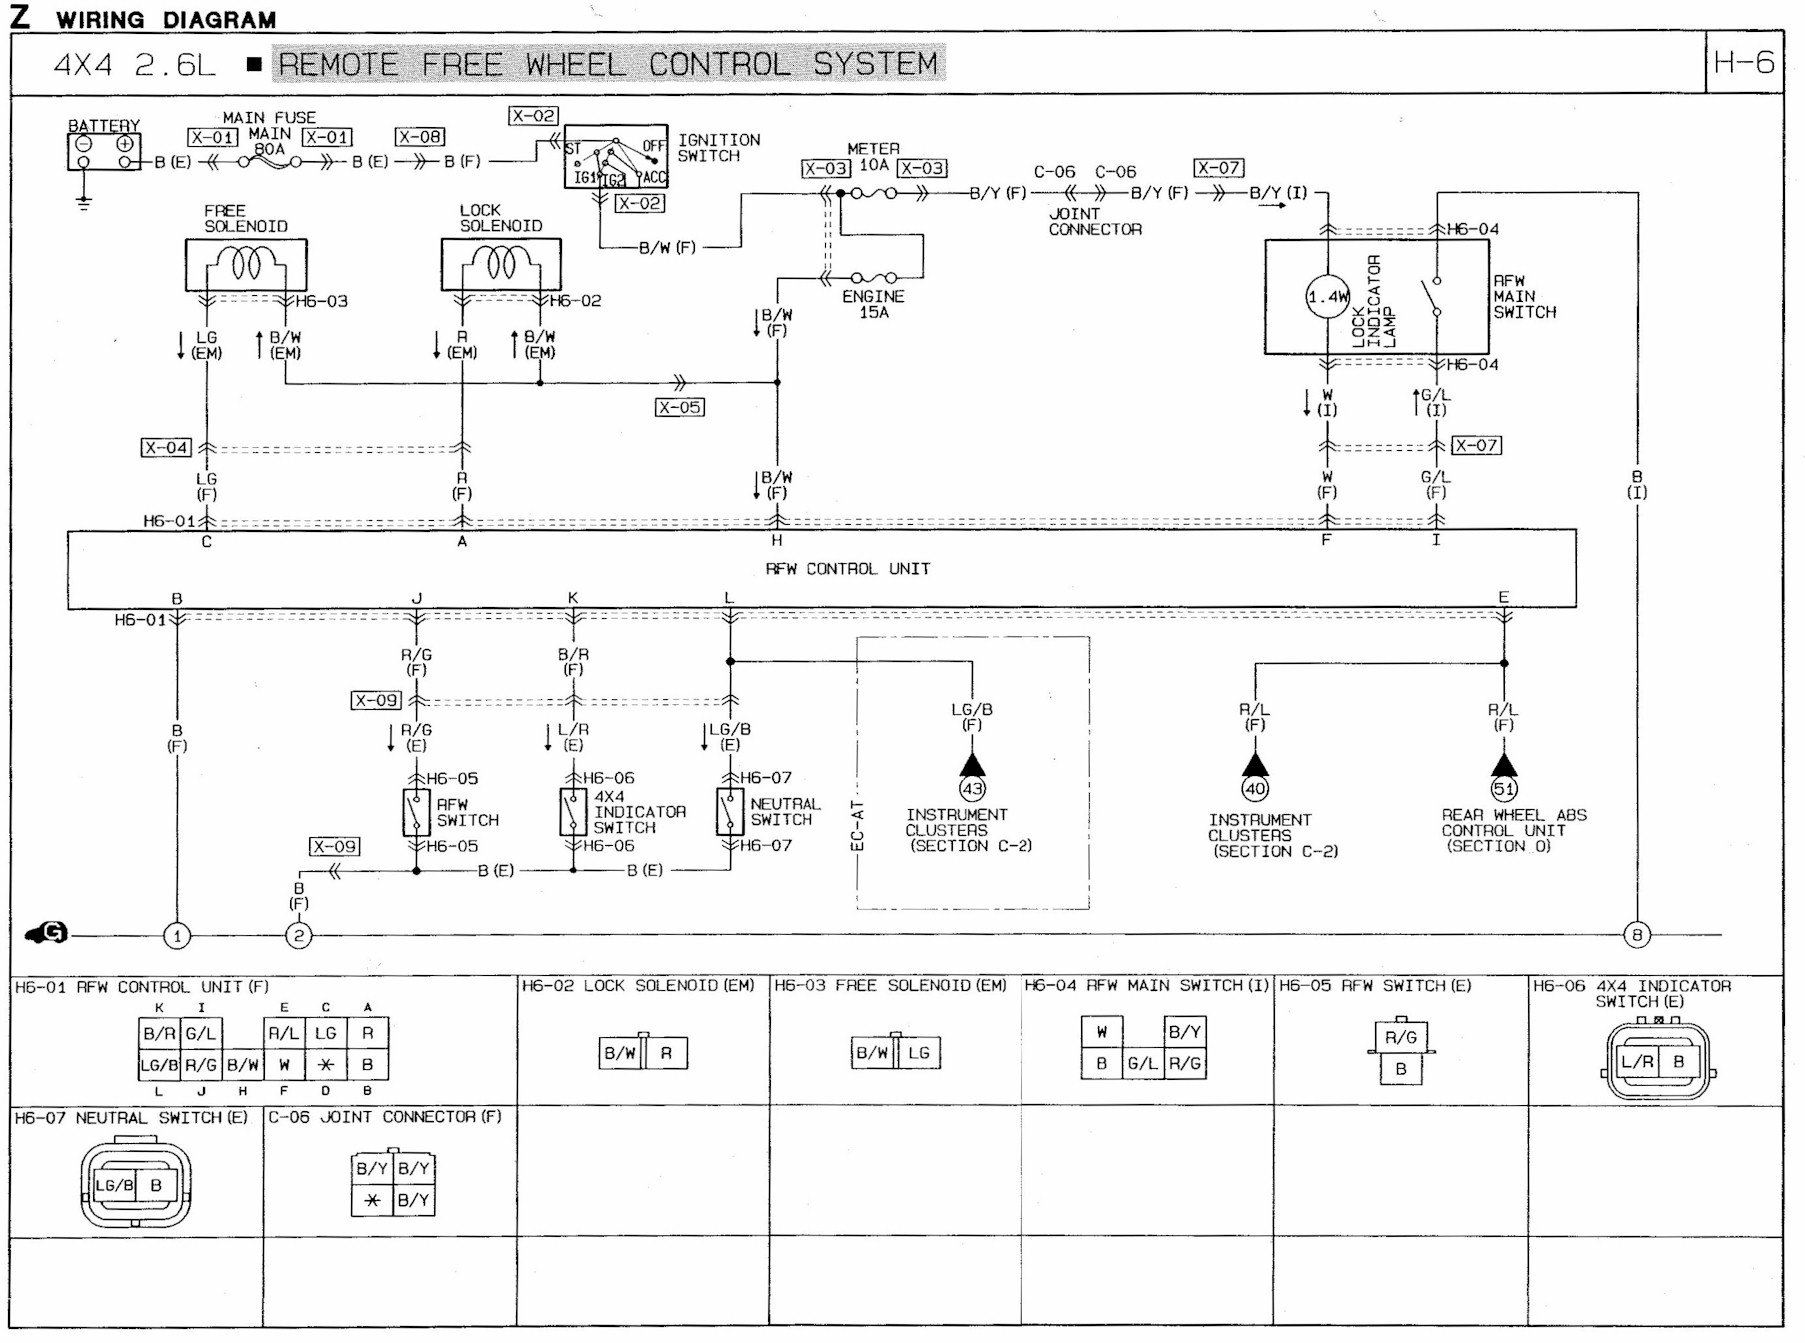 1989 Mazda B2600 Wiring Diagram